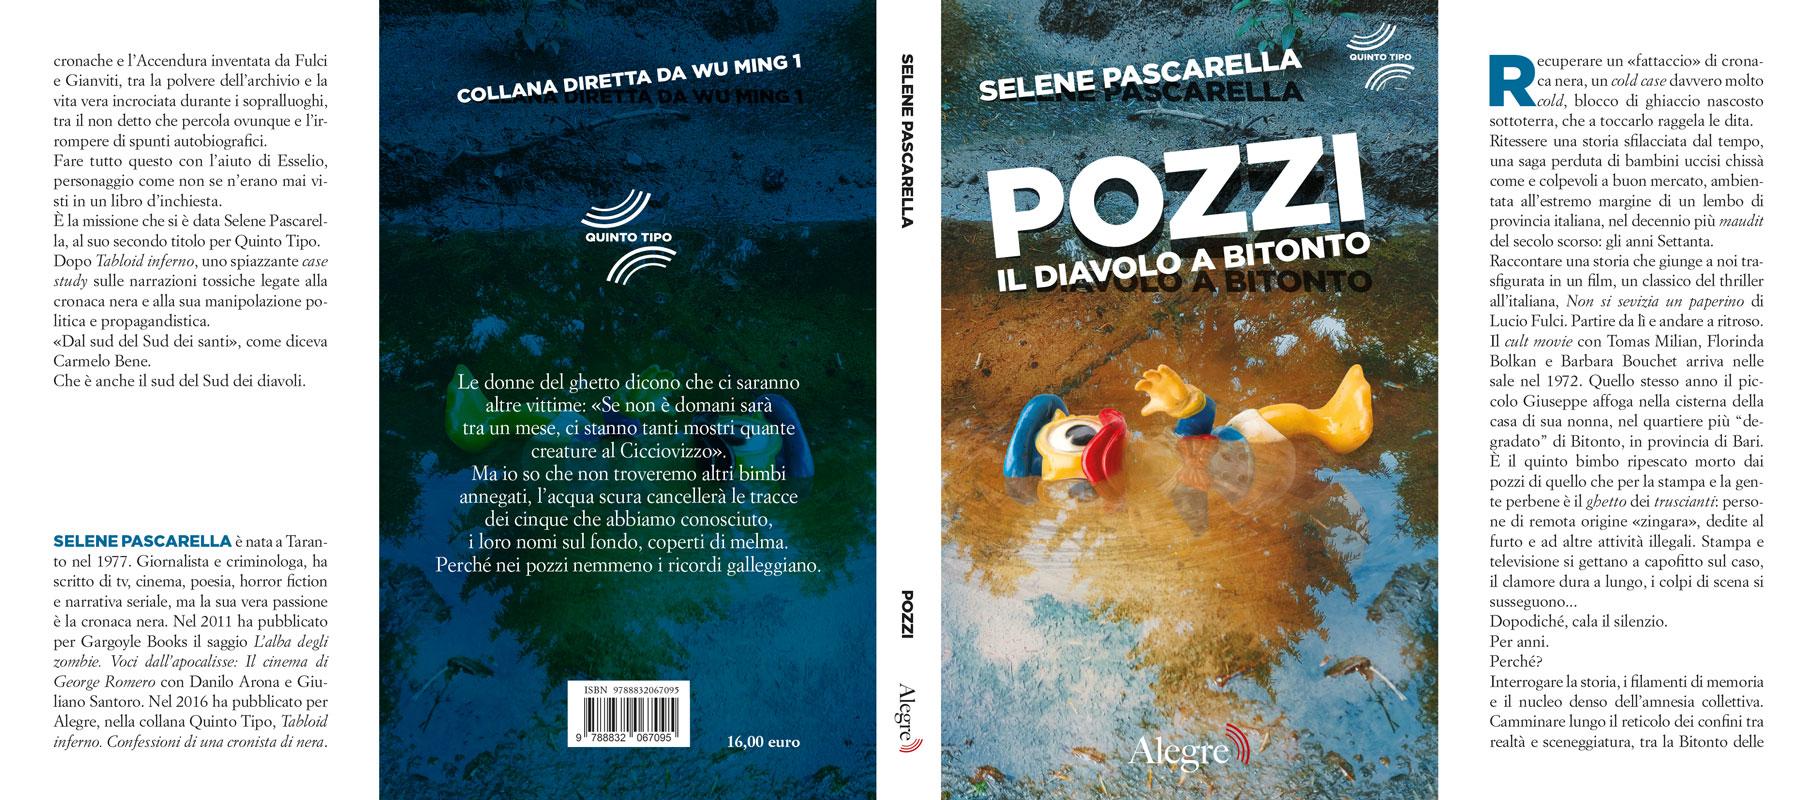 Selene Pascarella, Pozzi, stesa